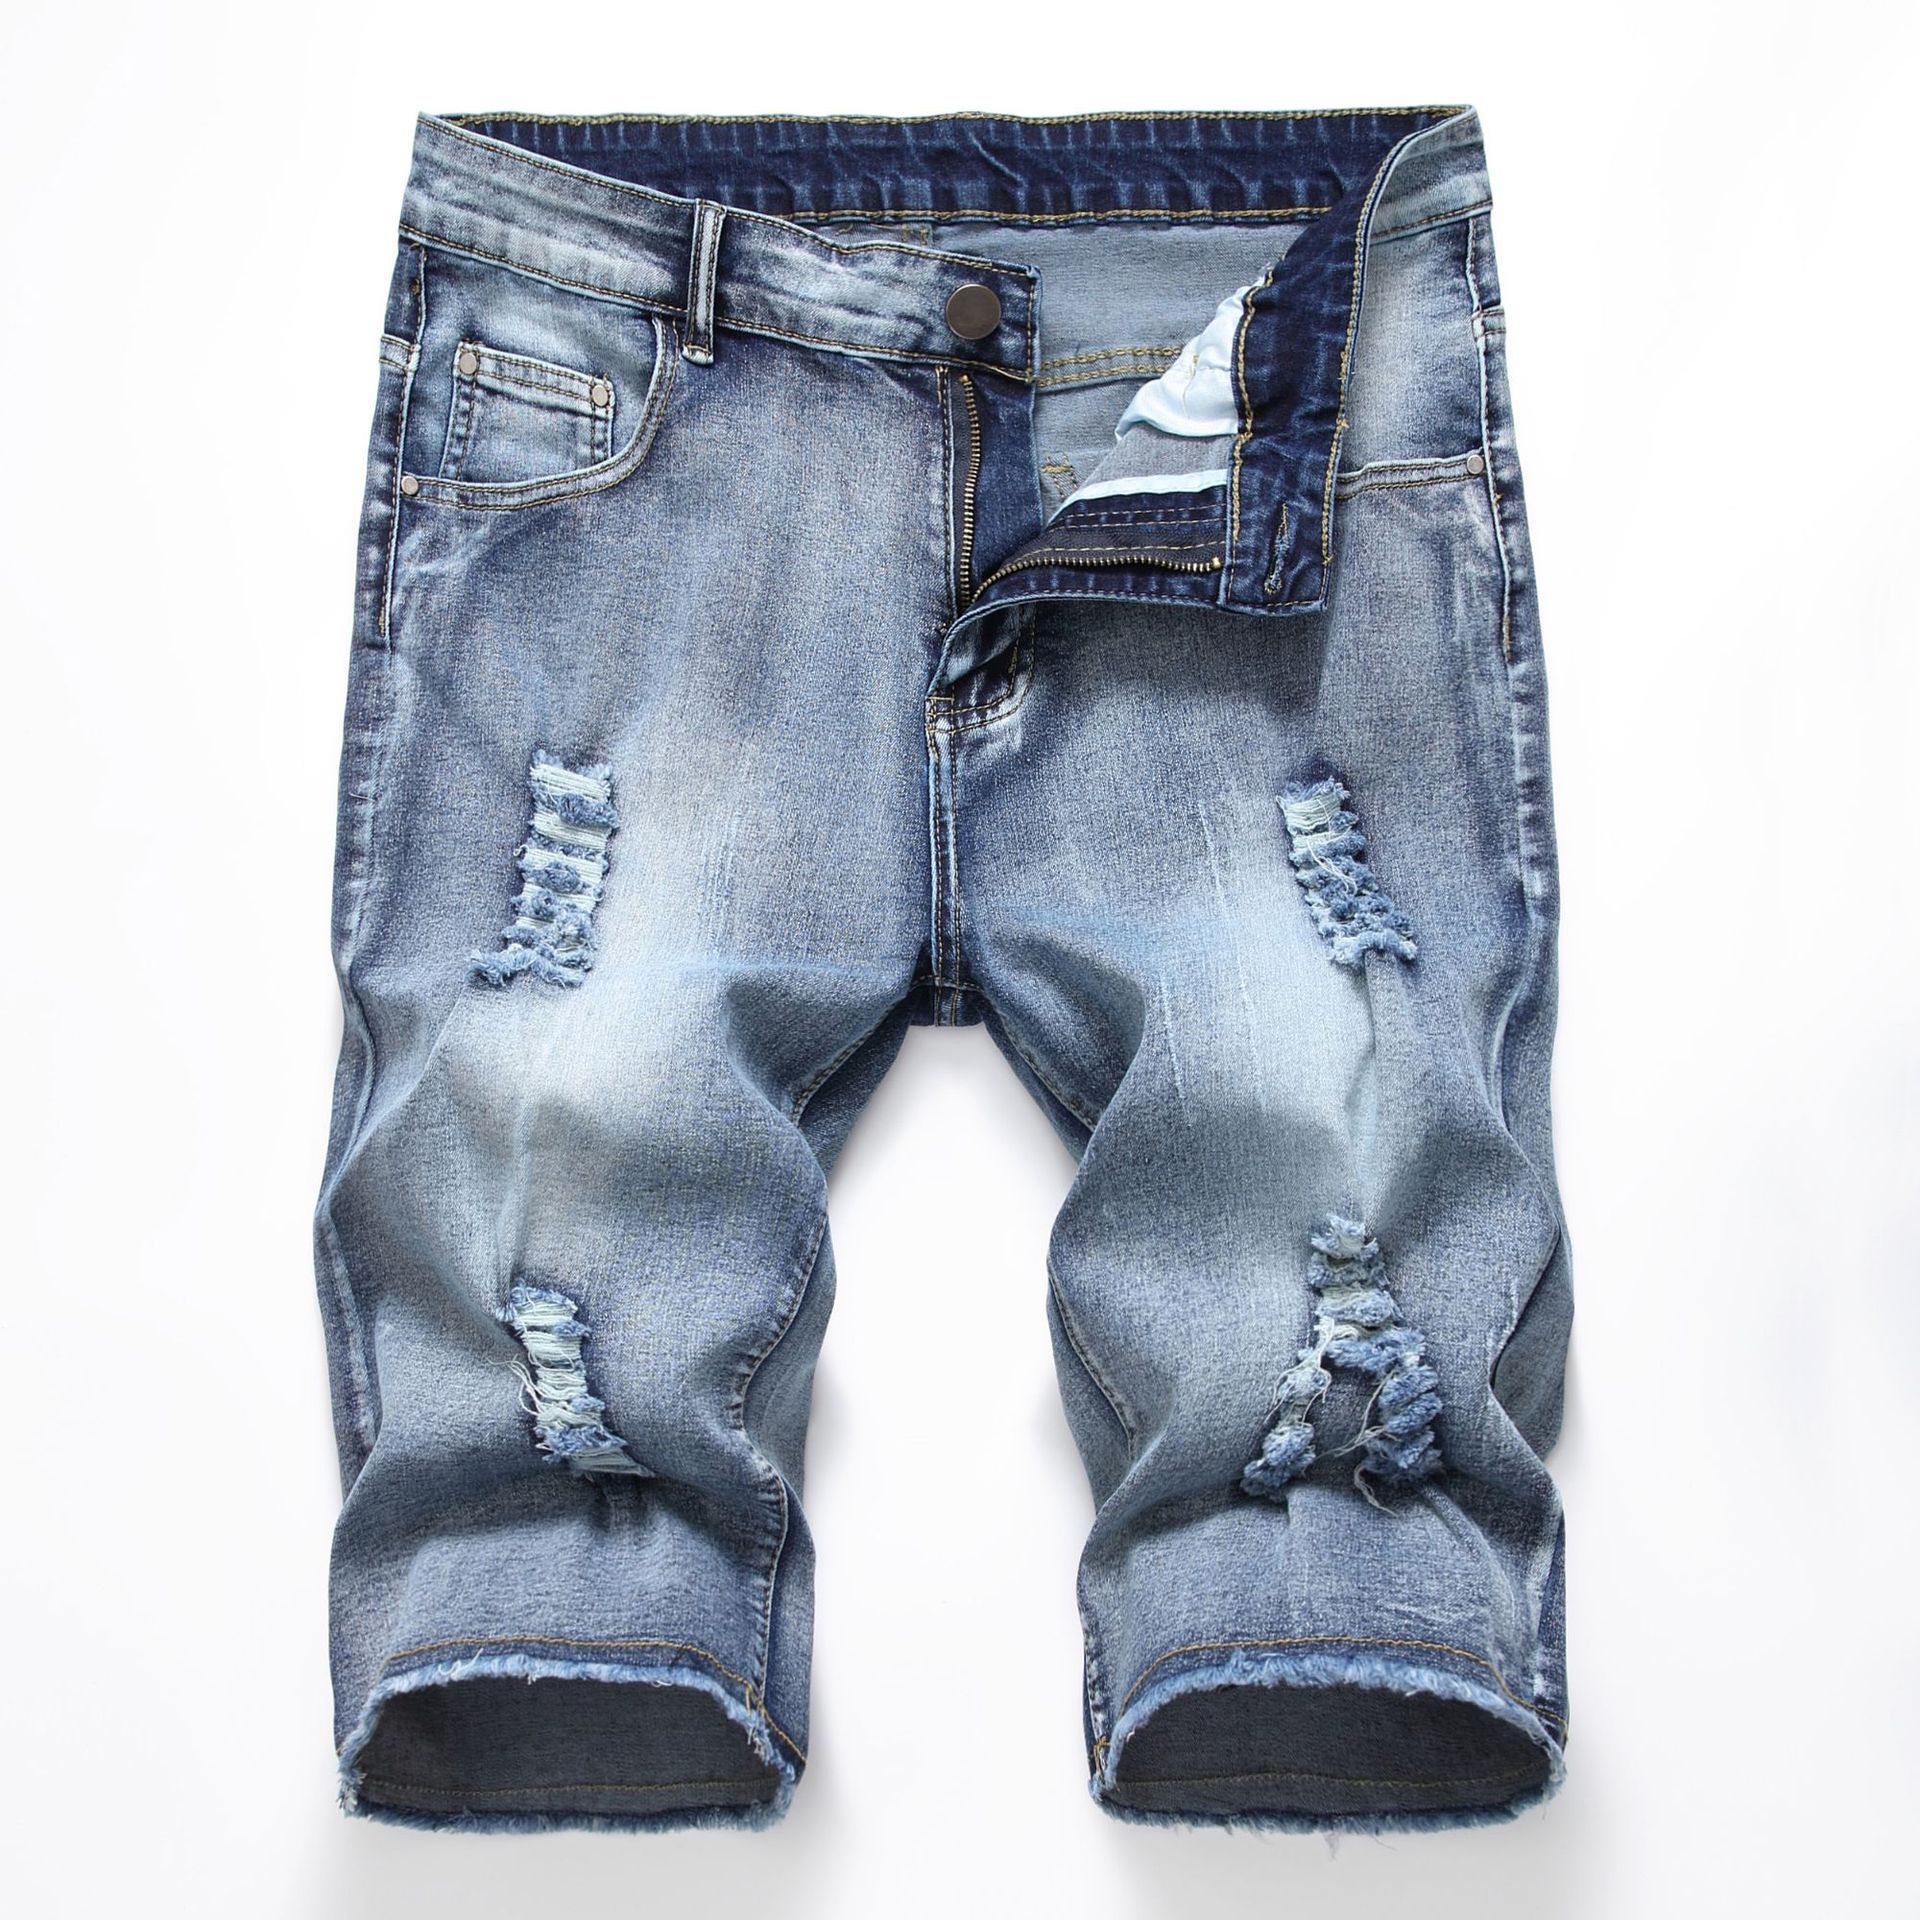 New Fashion Mens Ripped Short Jeans Brand Clothing Bermuda Summer Cotton Shorts Breathable Denim Shorts Male 28-42